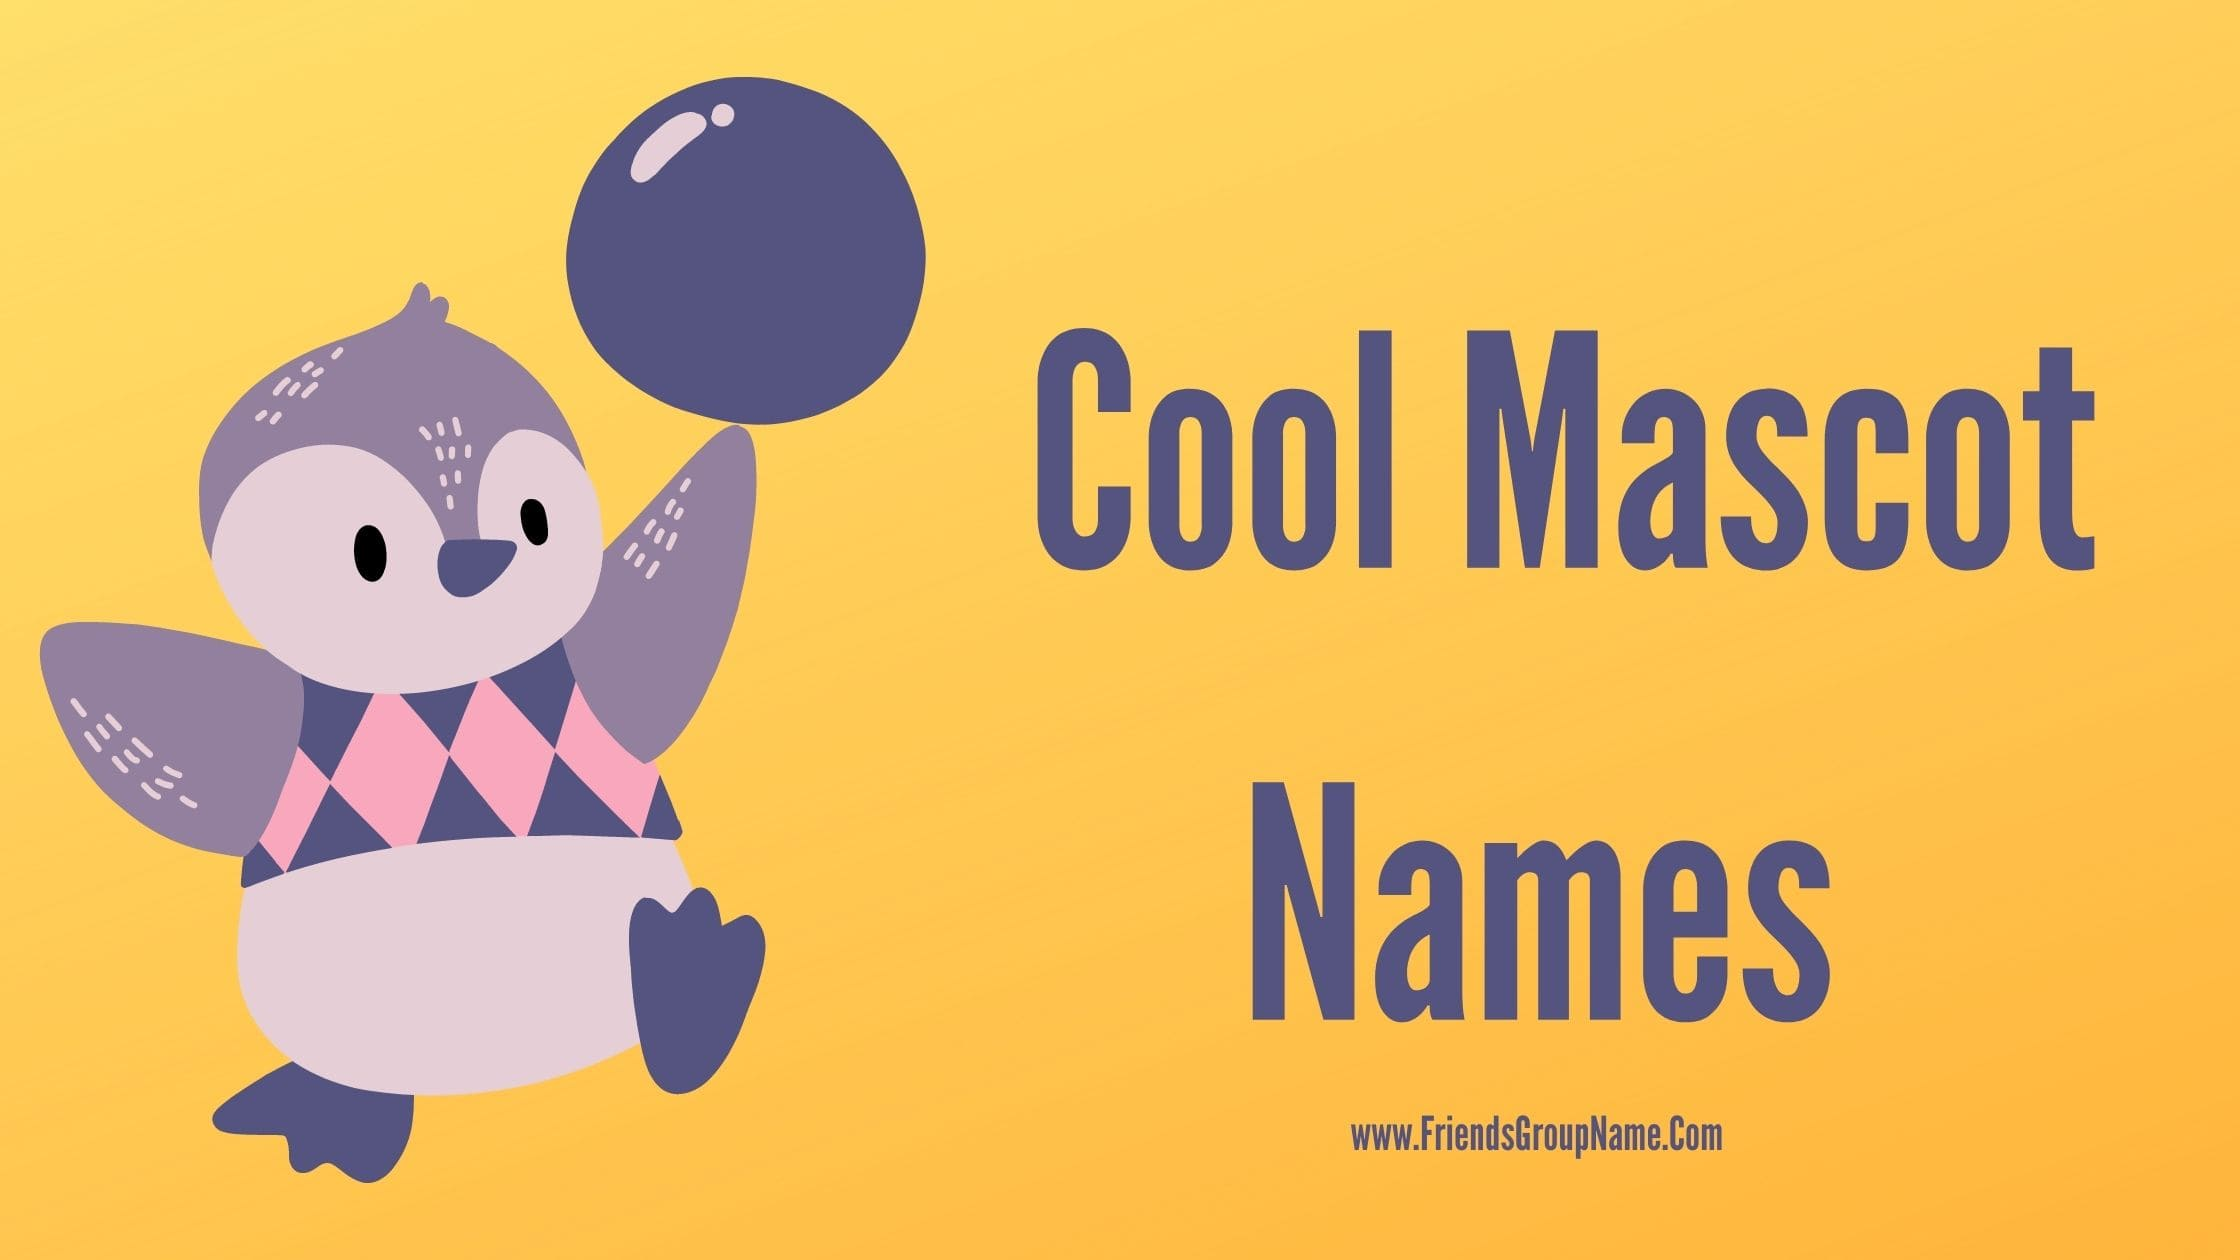 Cool Mascot Names